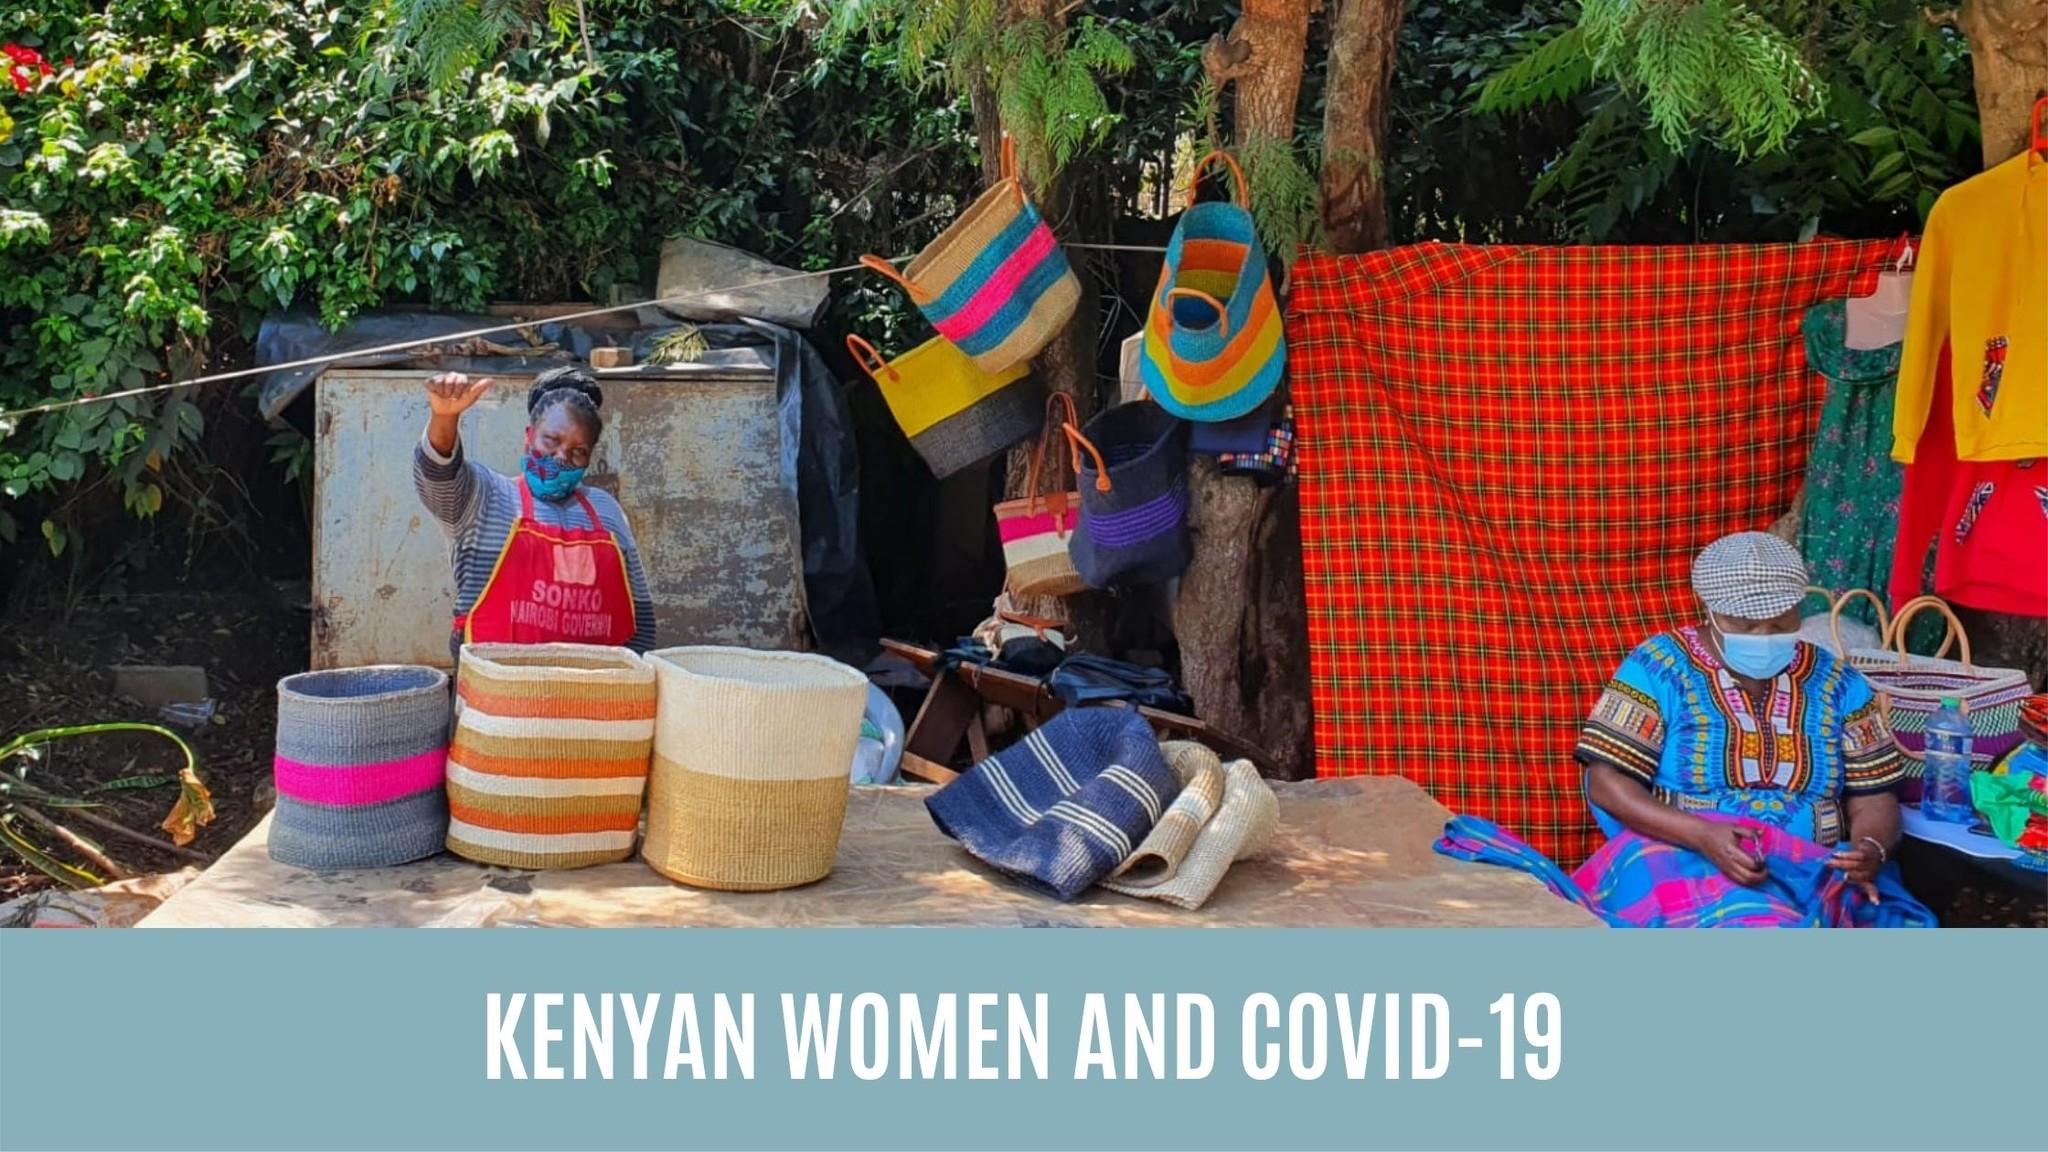 KENYAN WOMEN AND COVID-19